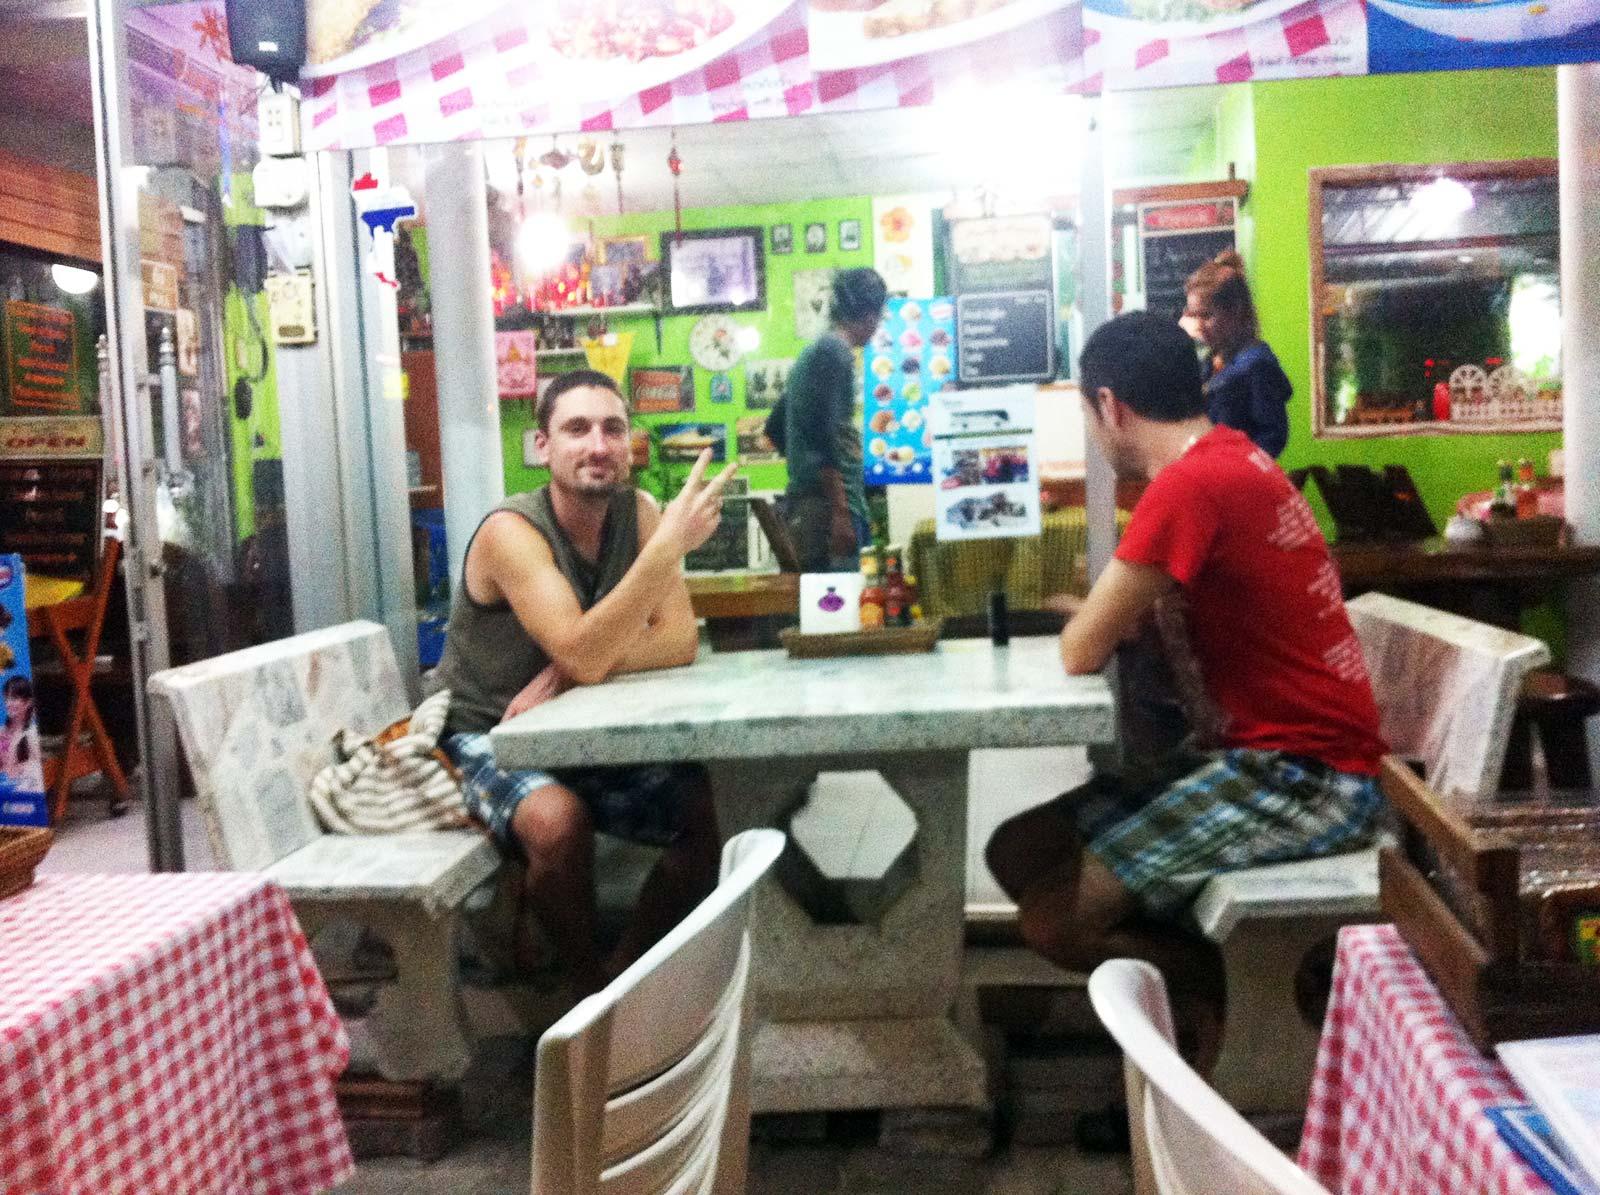 Koh Samui Food Corner; Reisetipps Koh Samui Urlaub; Restaurant Tipps Koh Samui;